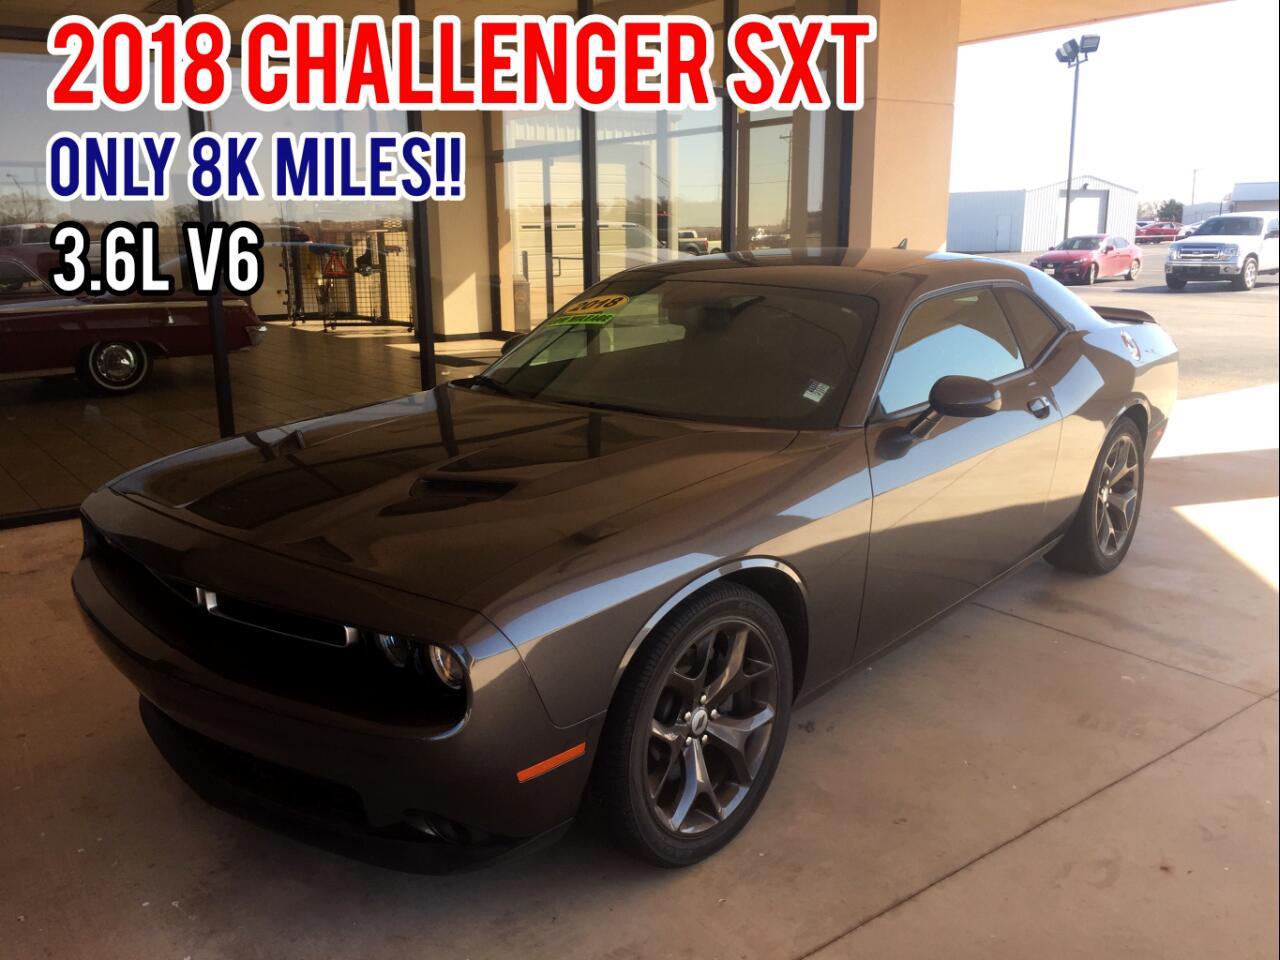 Dodge Challenger SXT RWD 2018